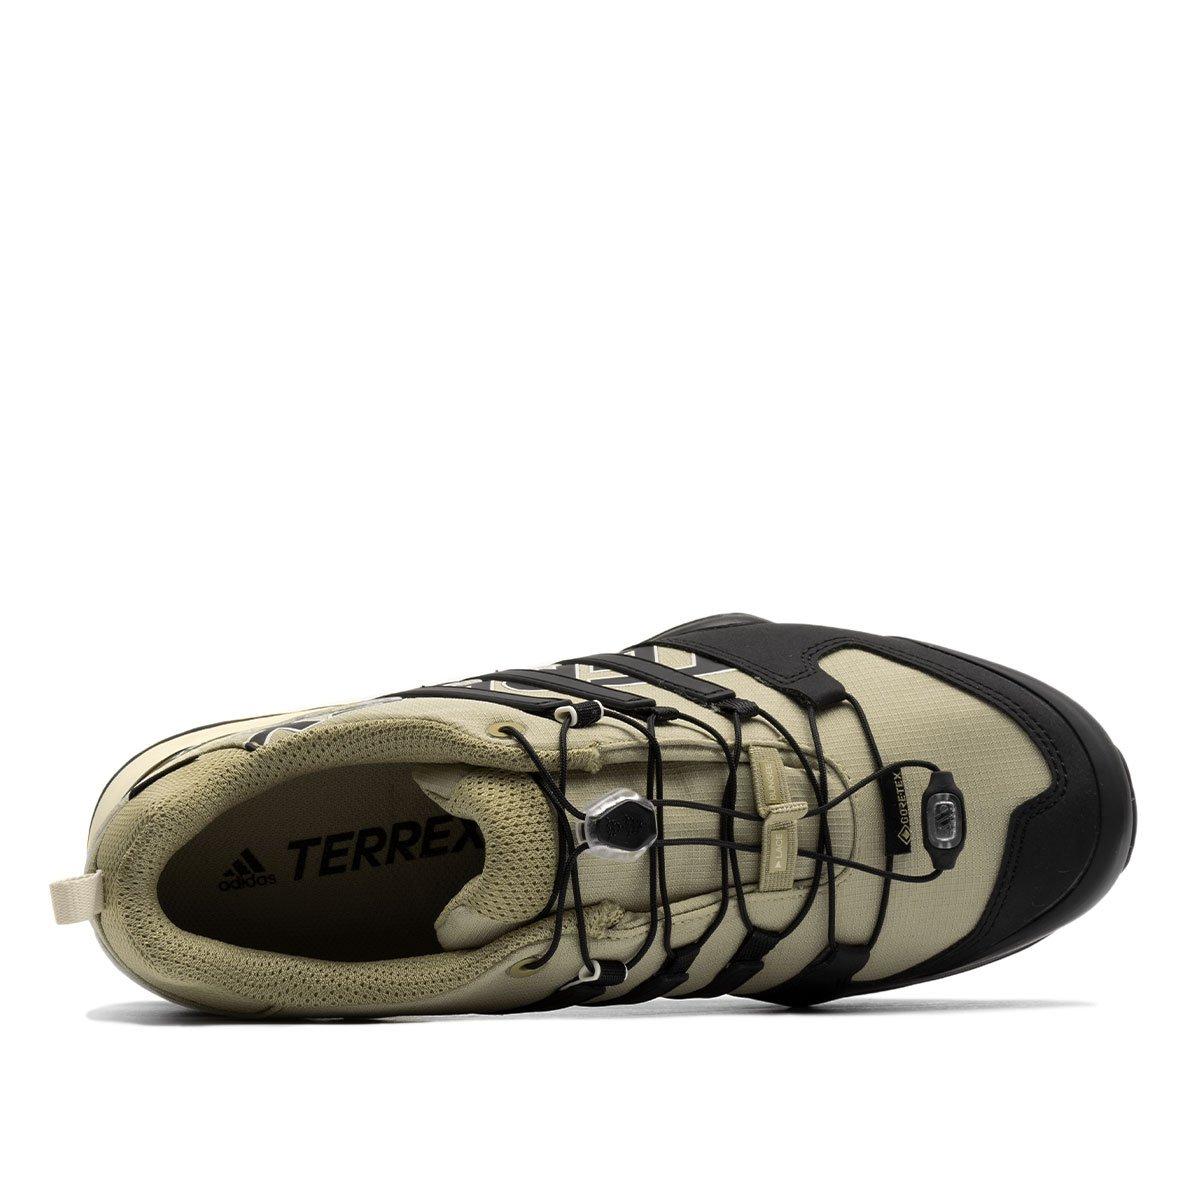 Adidas Terrex Swift R2 Gore-Tex